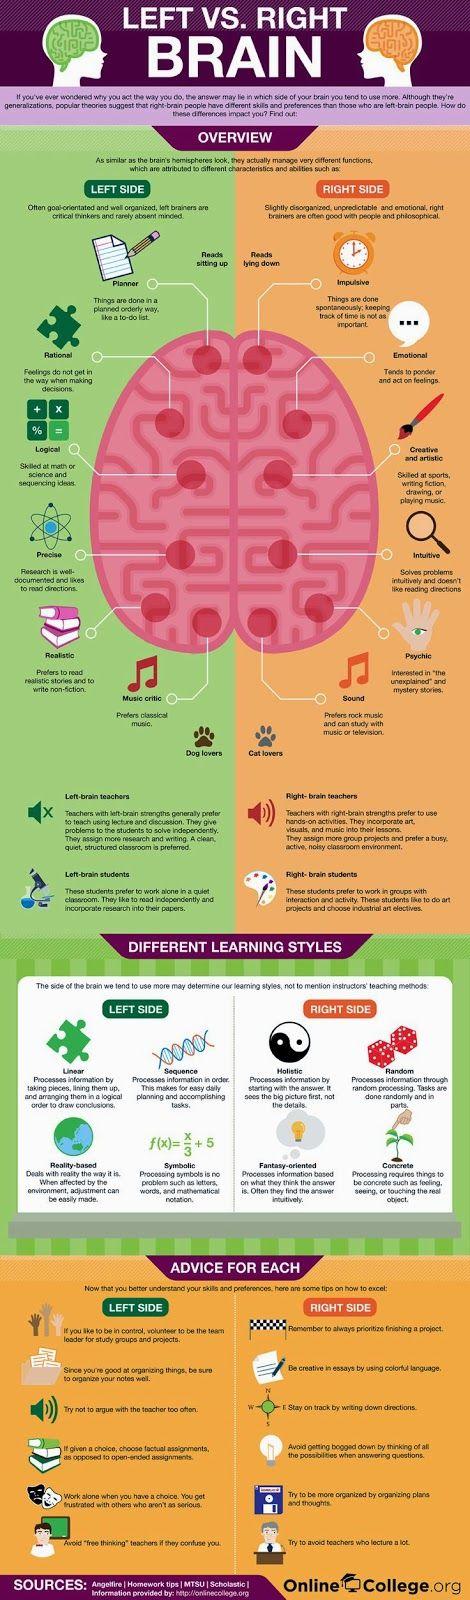 Left Brain Vs. Right Brain - The Eye Opening Insights